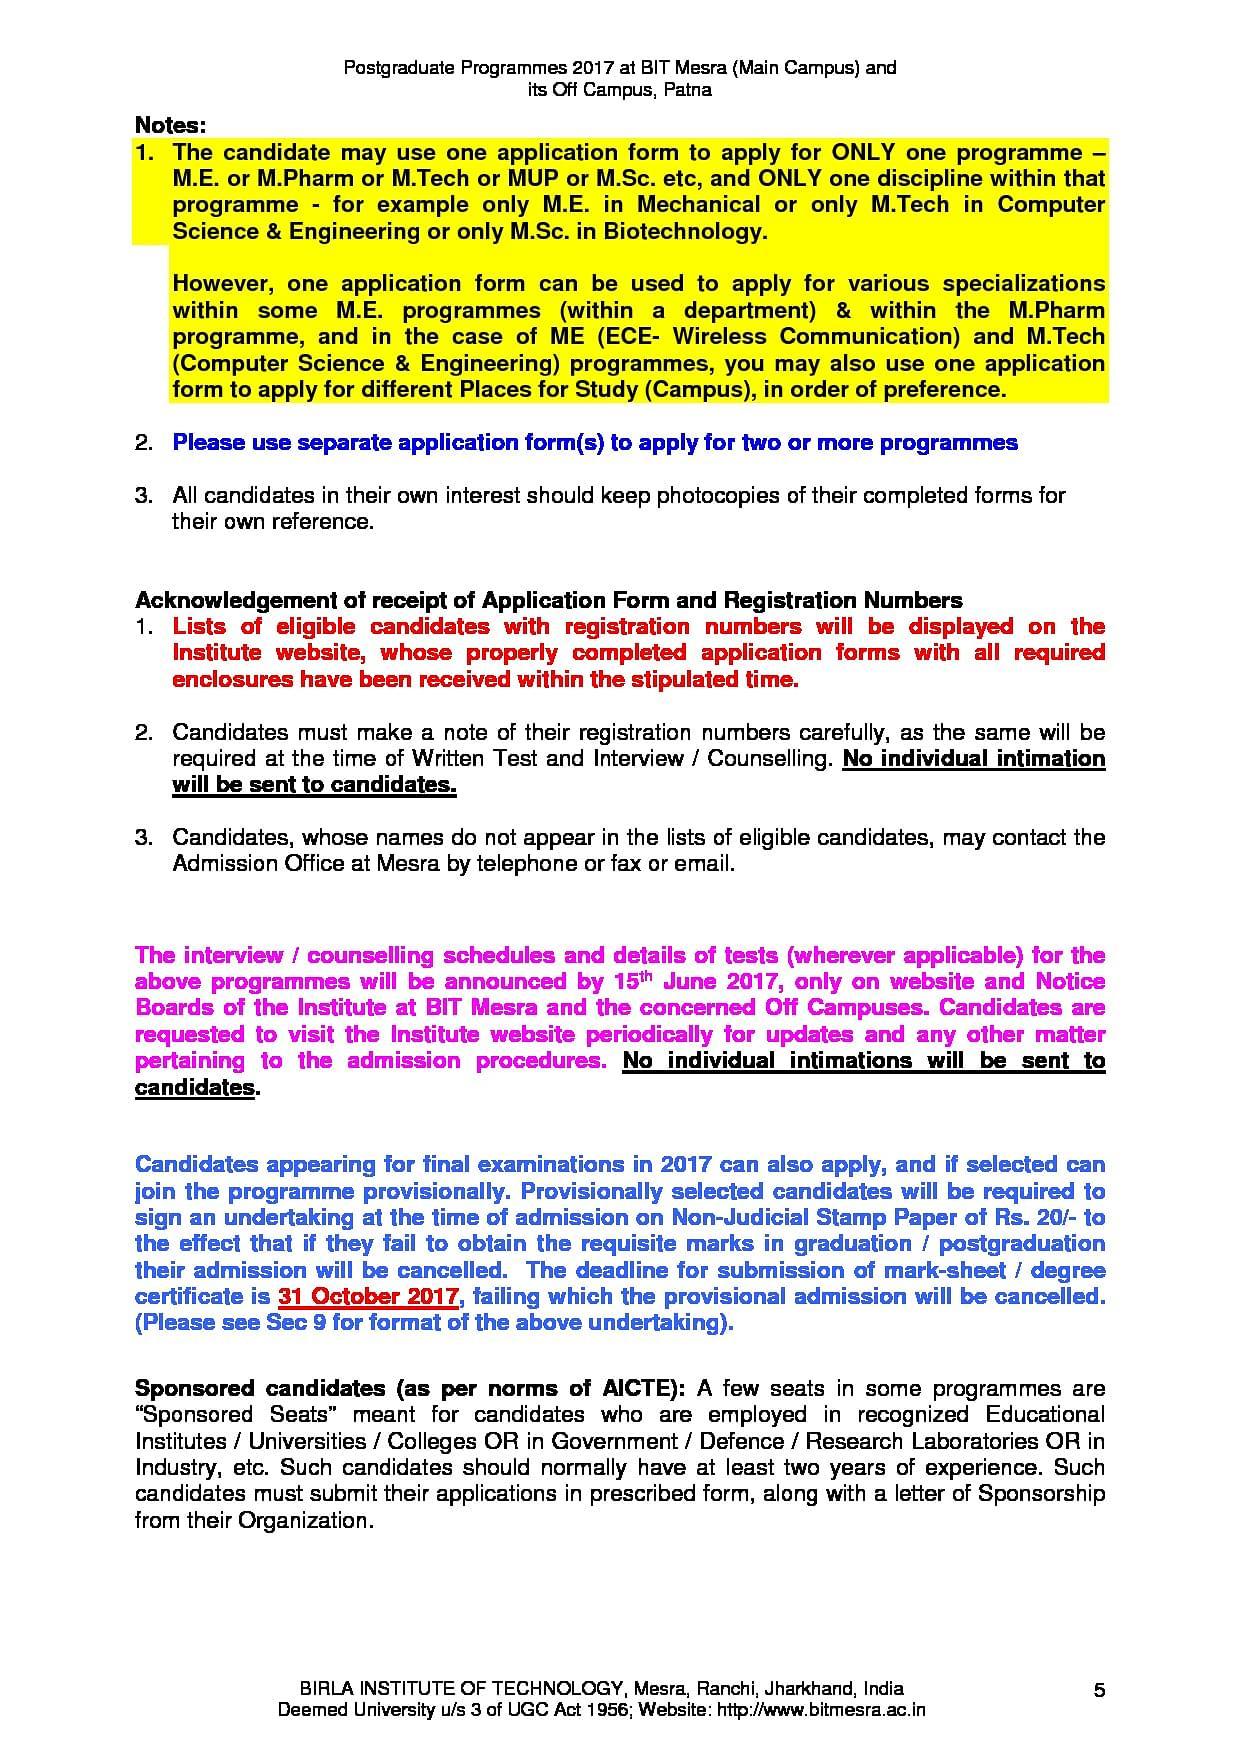 Birla Institute of Technology - [BIT Mesra], Ranchi - Admissions ...